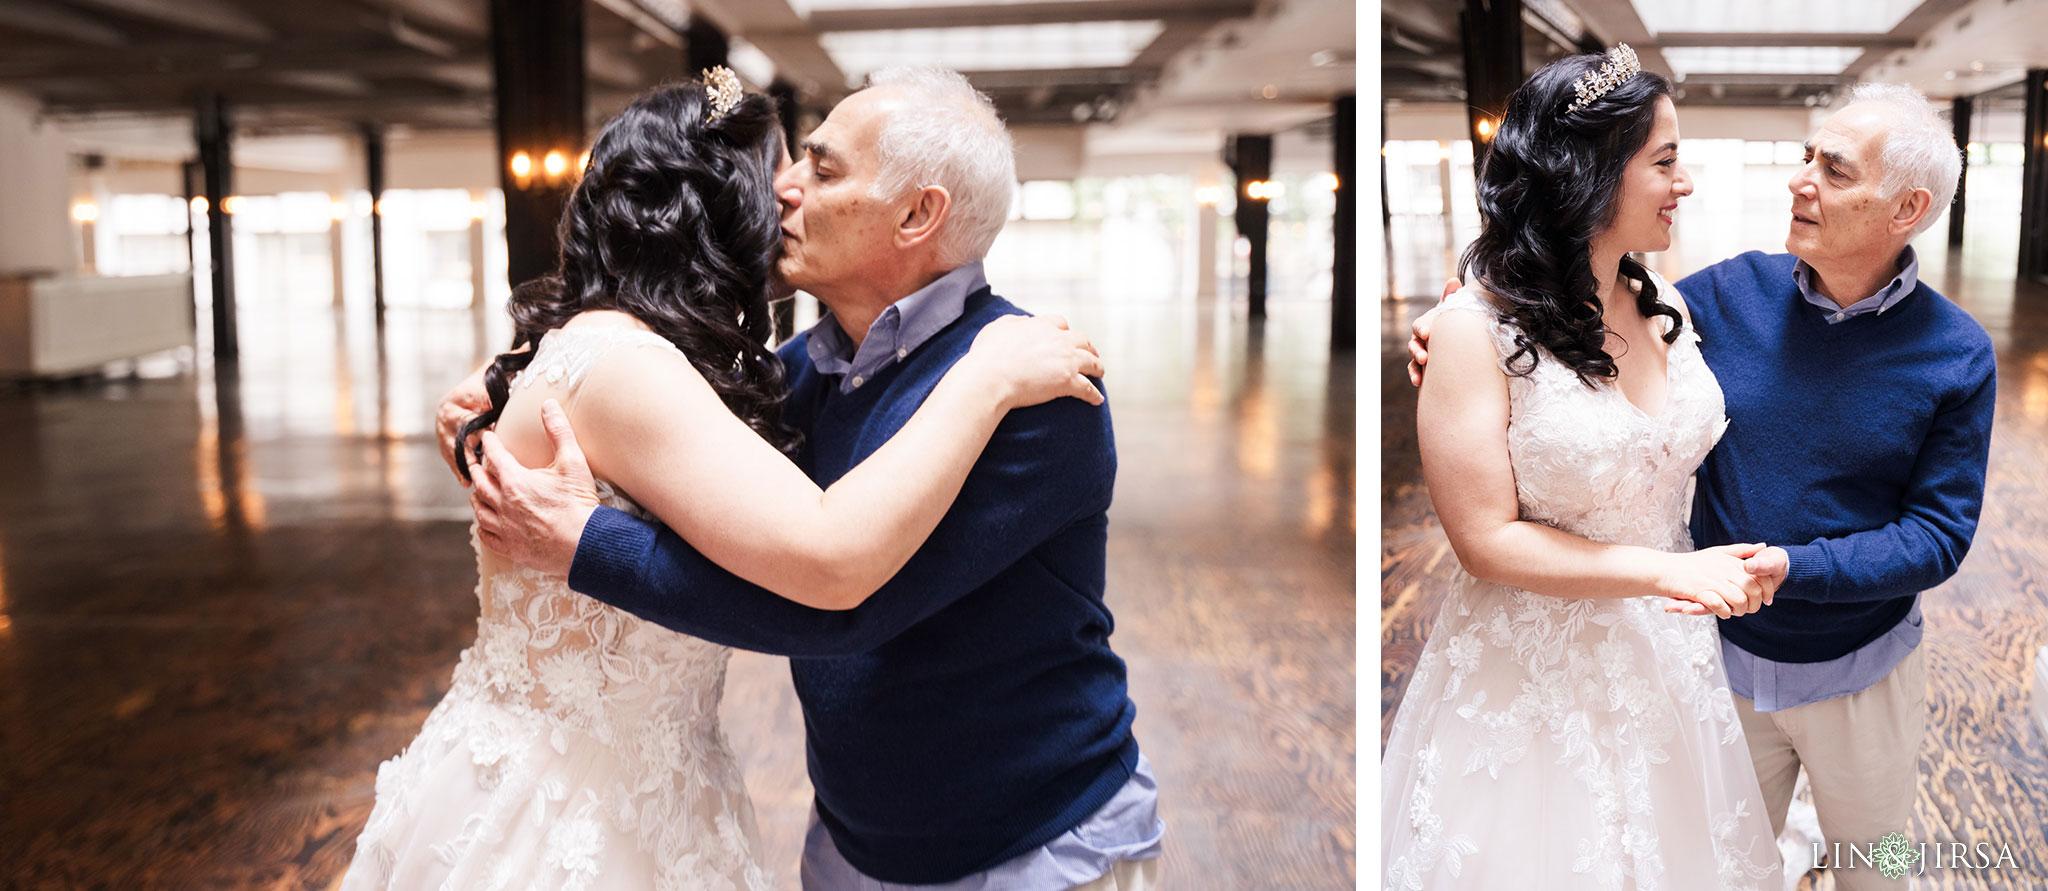 05 Alexandria Ballrooms Los Angeles Jewish Wedding Photography